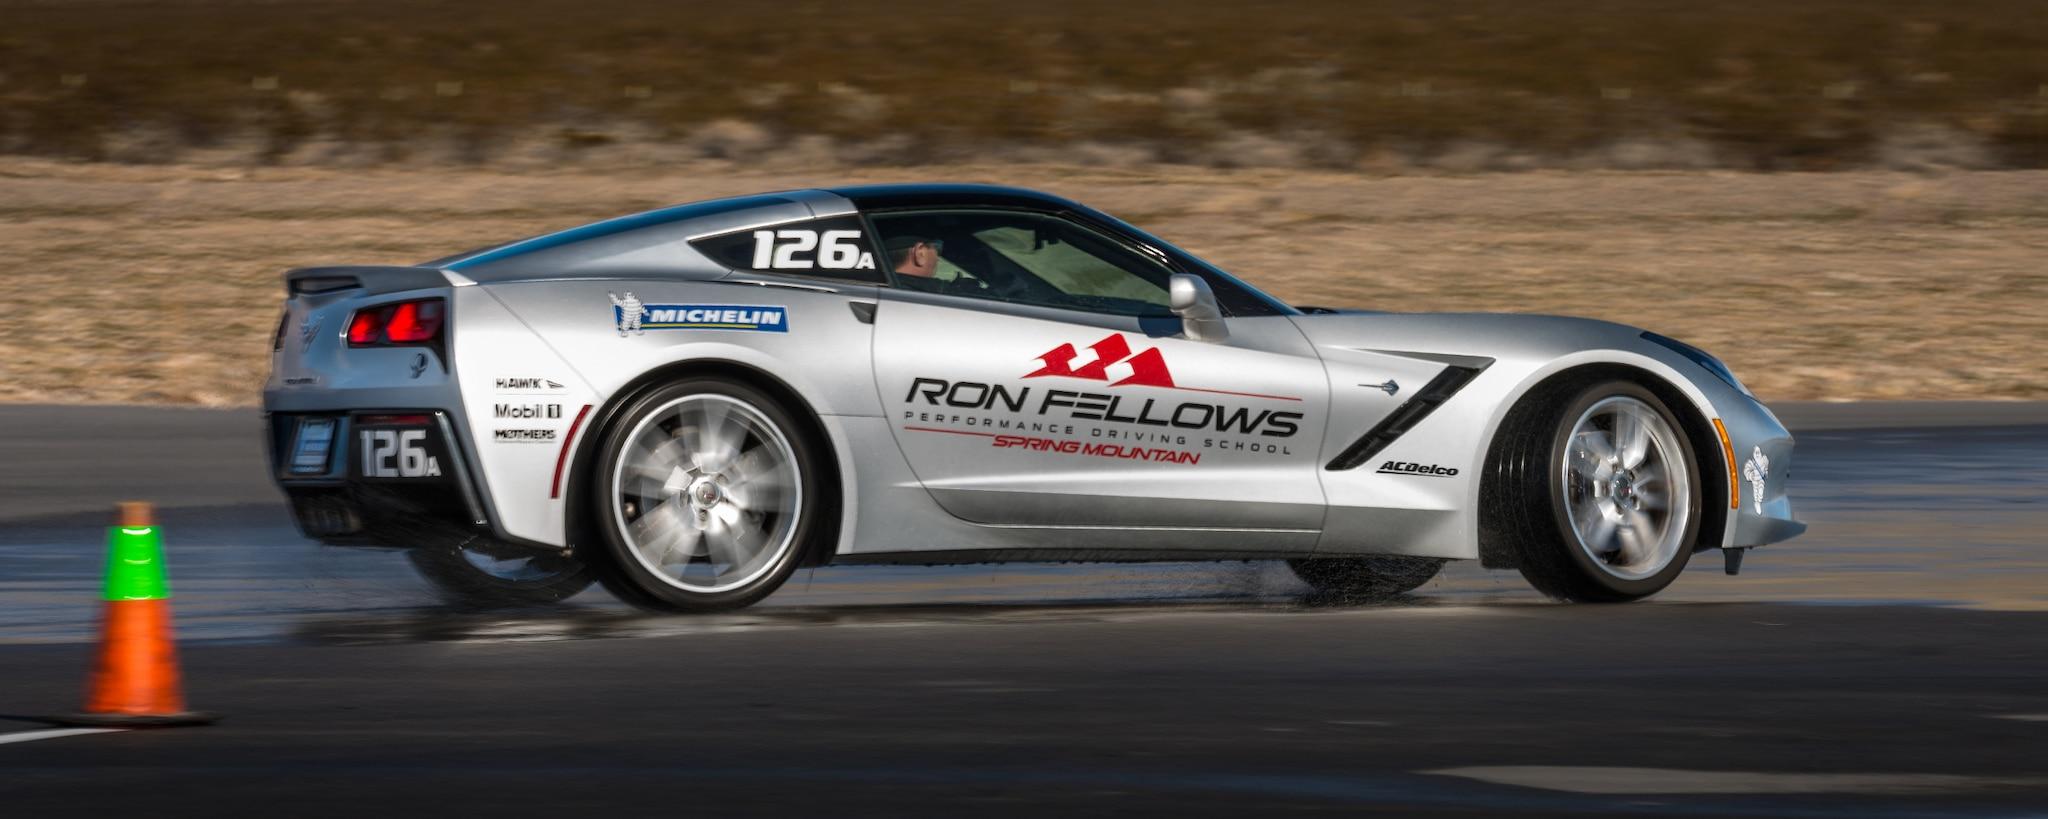 Exclusivos del auto deportivo Corvette Stingray 2018